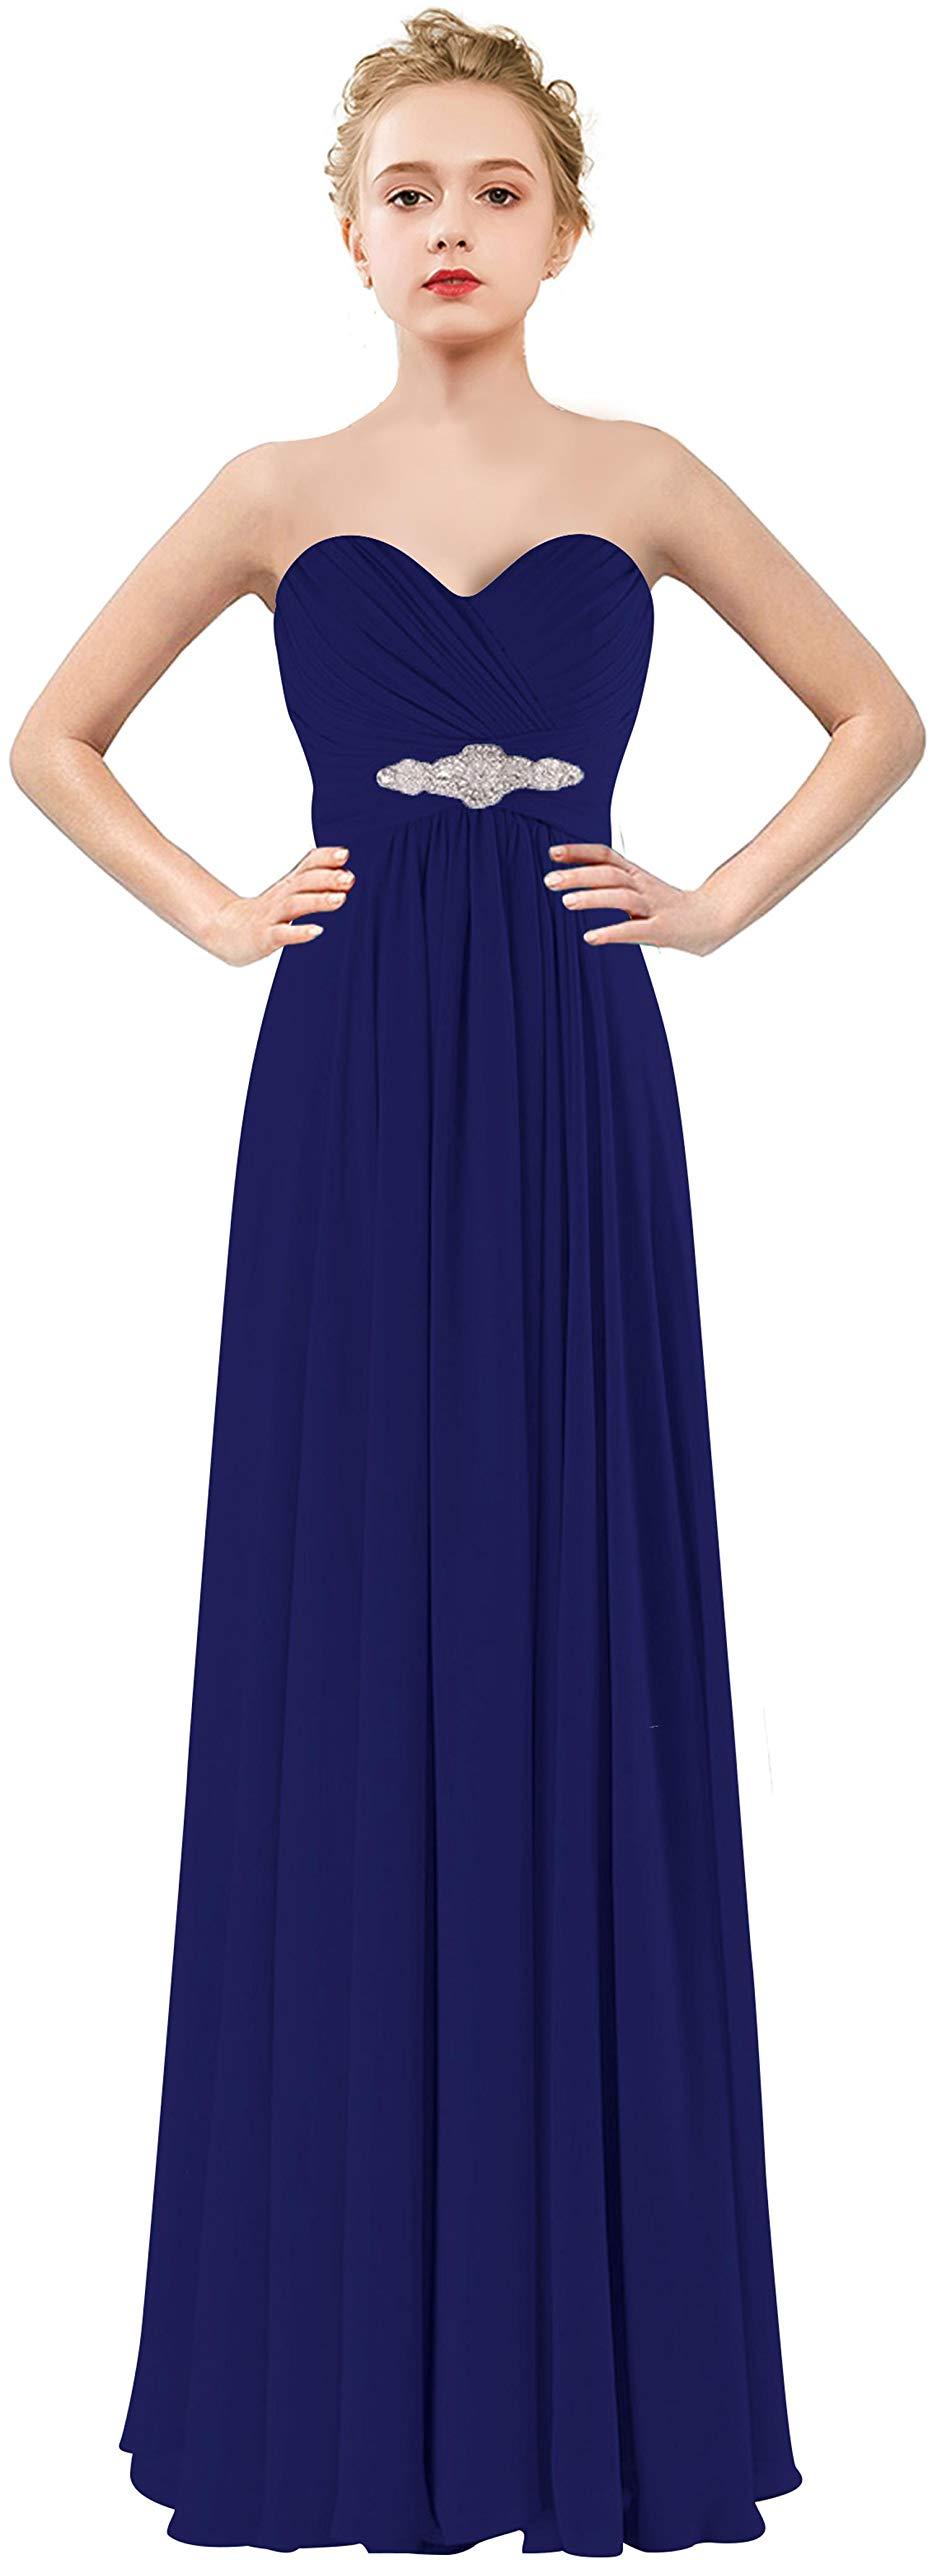 CaliaDress Women Elegant Strapless Bridesmaid Dress Long Prom Formal Gowns C271LF Royal Blue US8